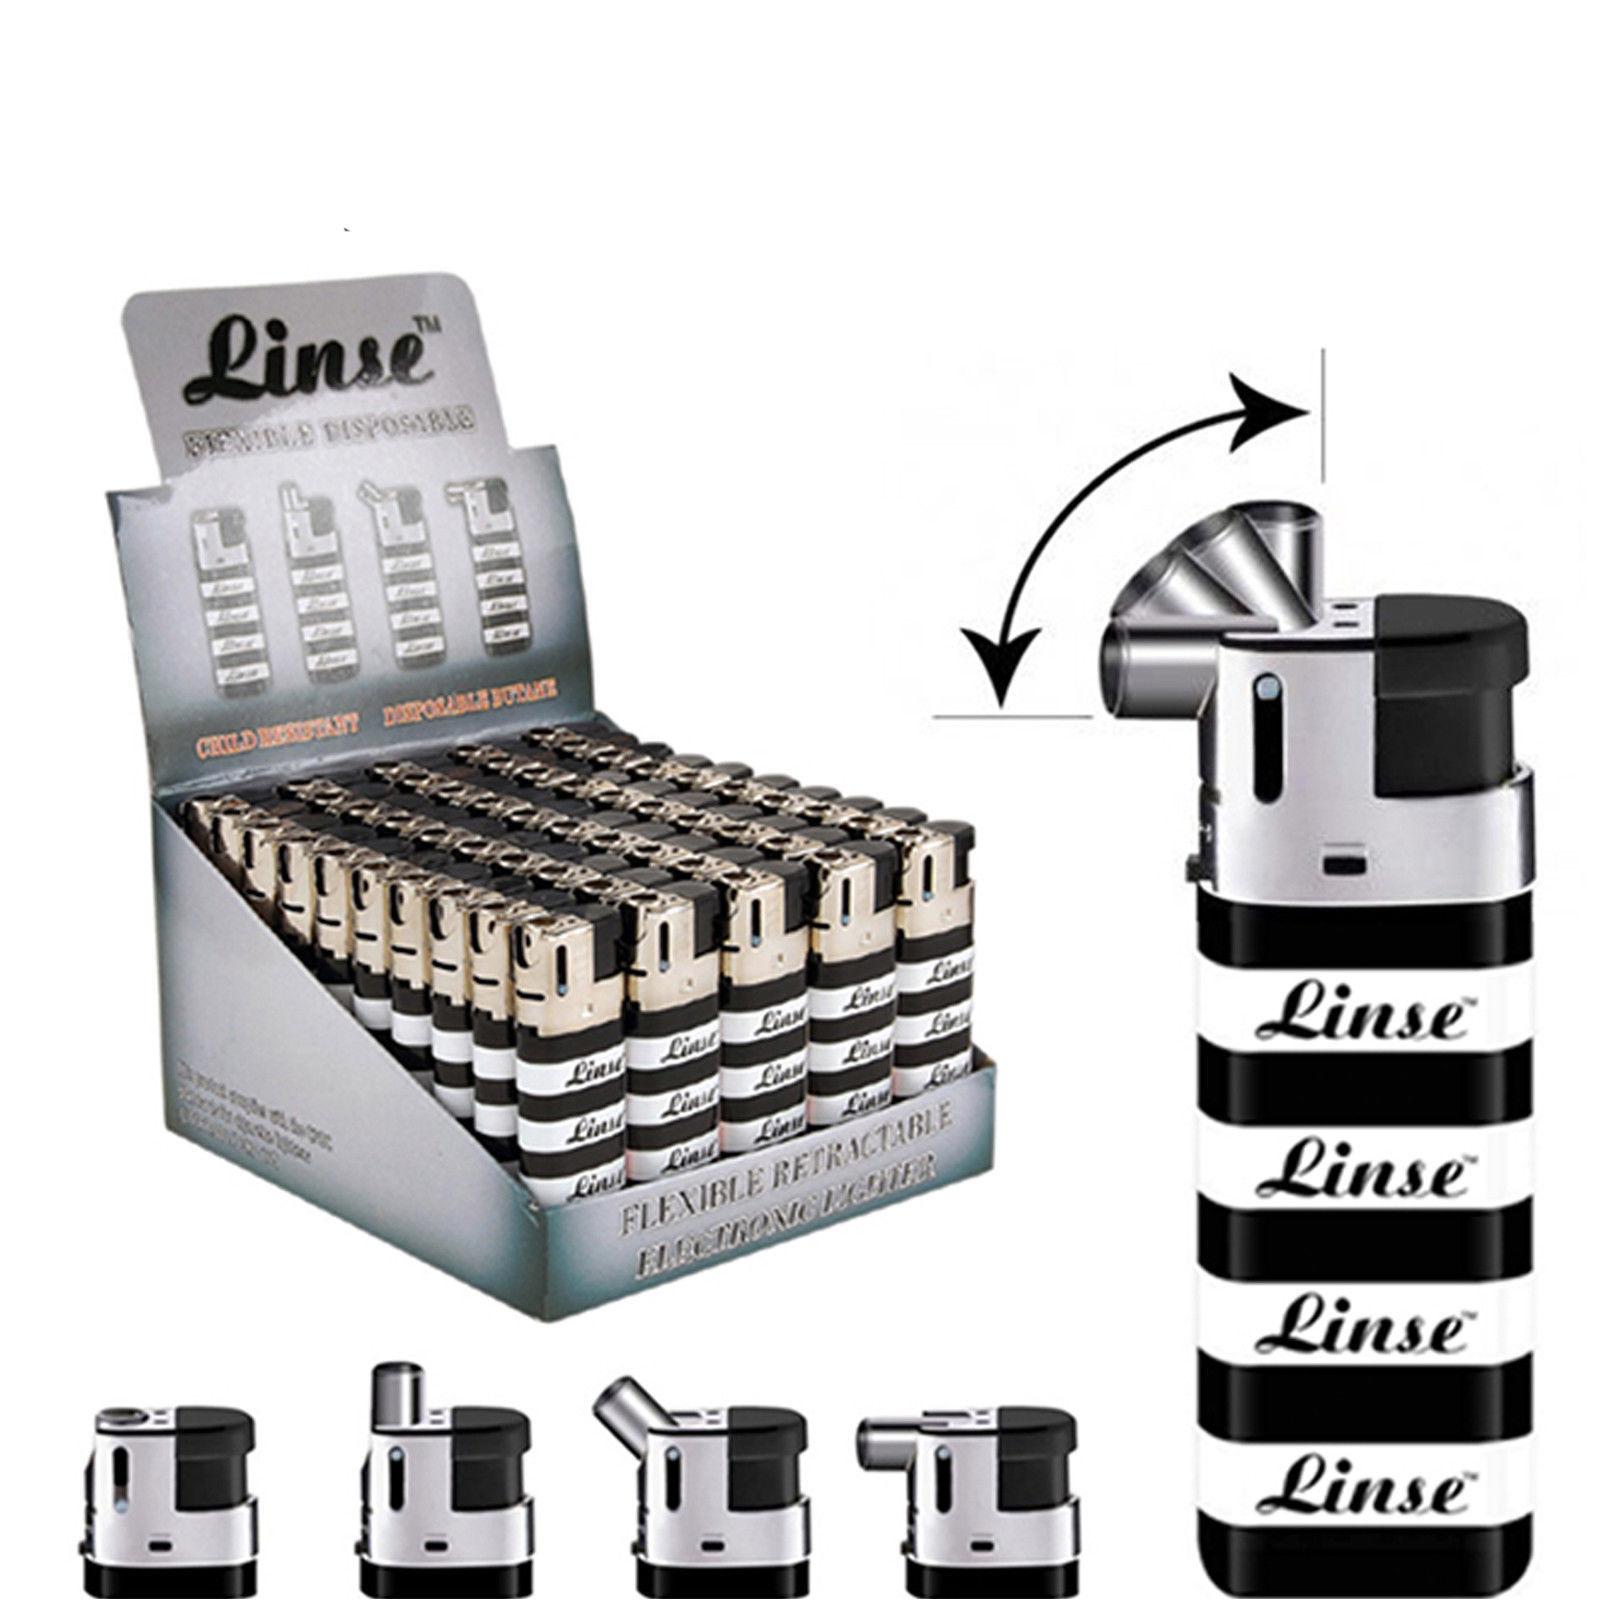 6 Pack Linse Lighters Flexible Swivel Nozzle Linse Disposable Butane Lighter